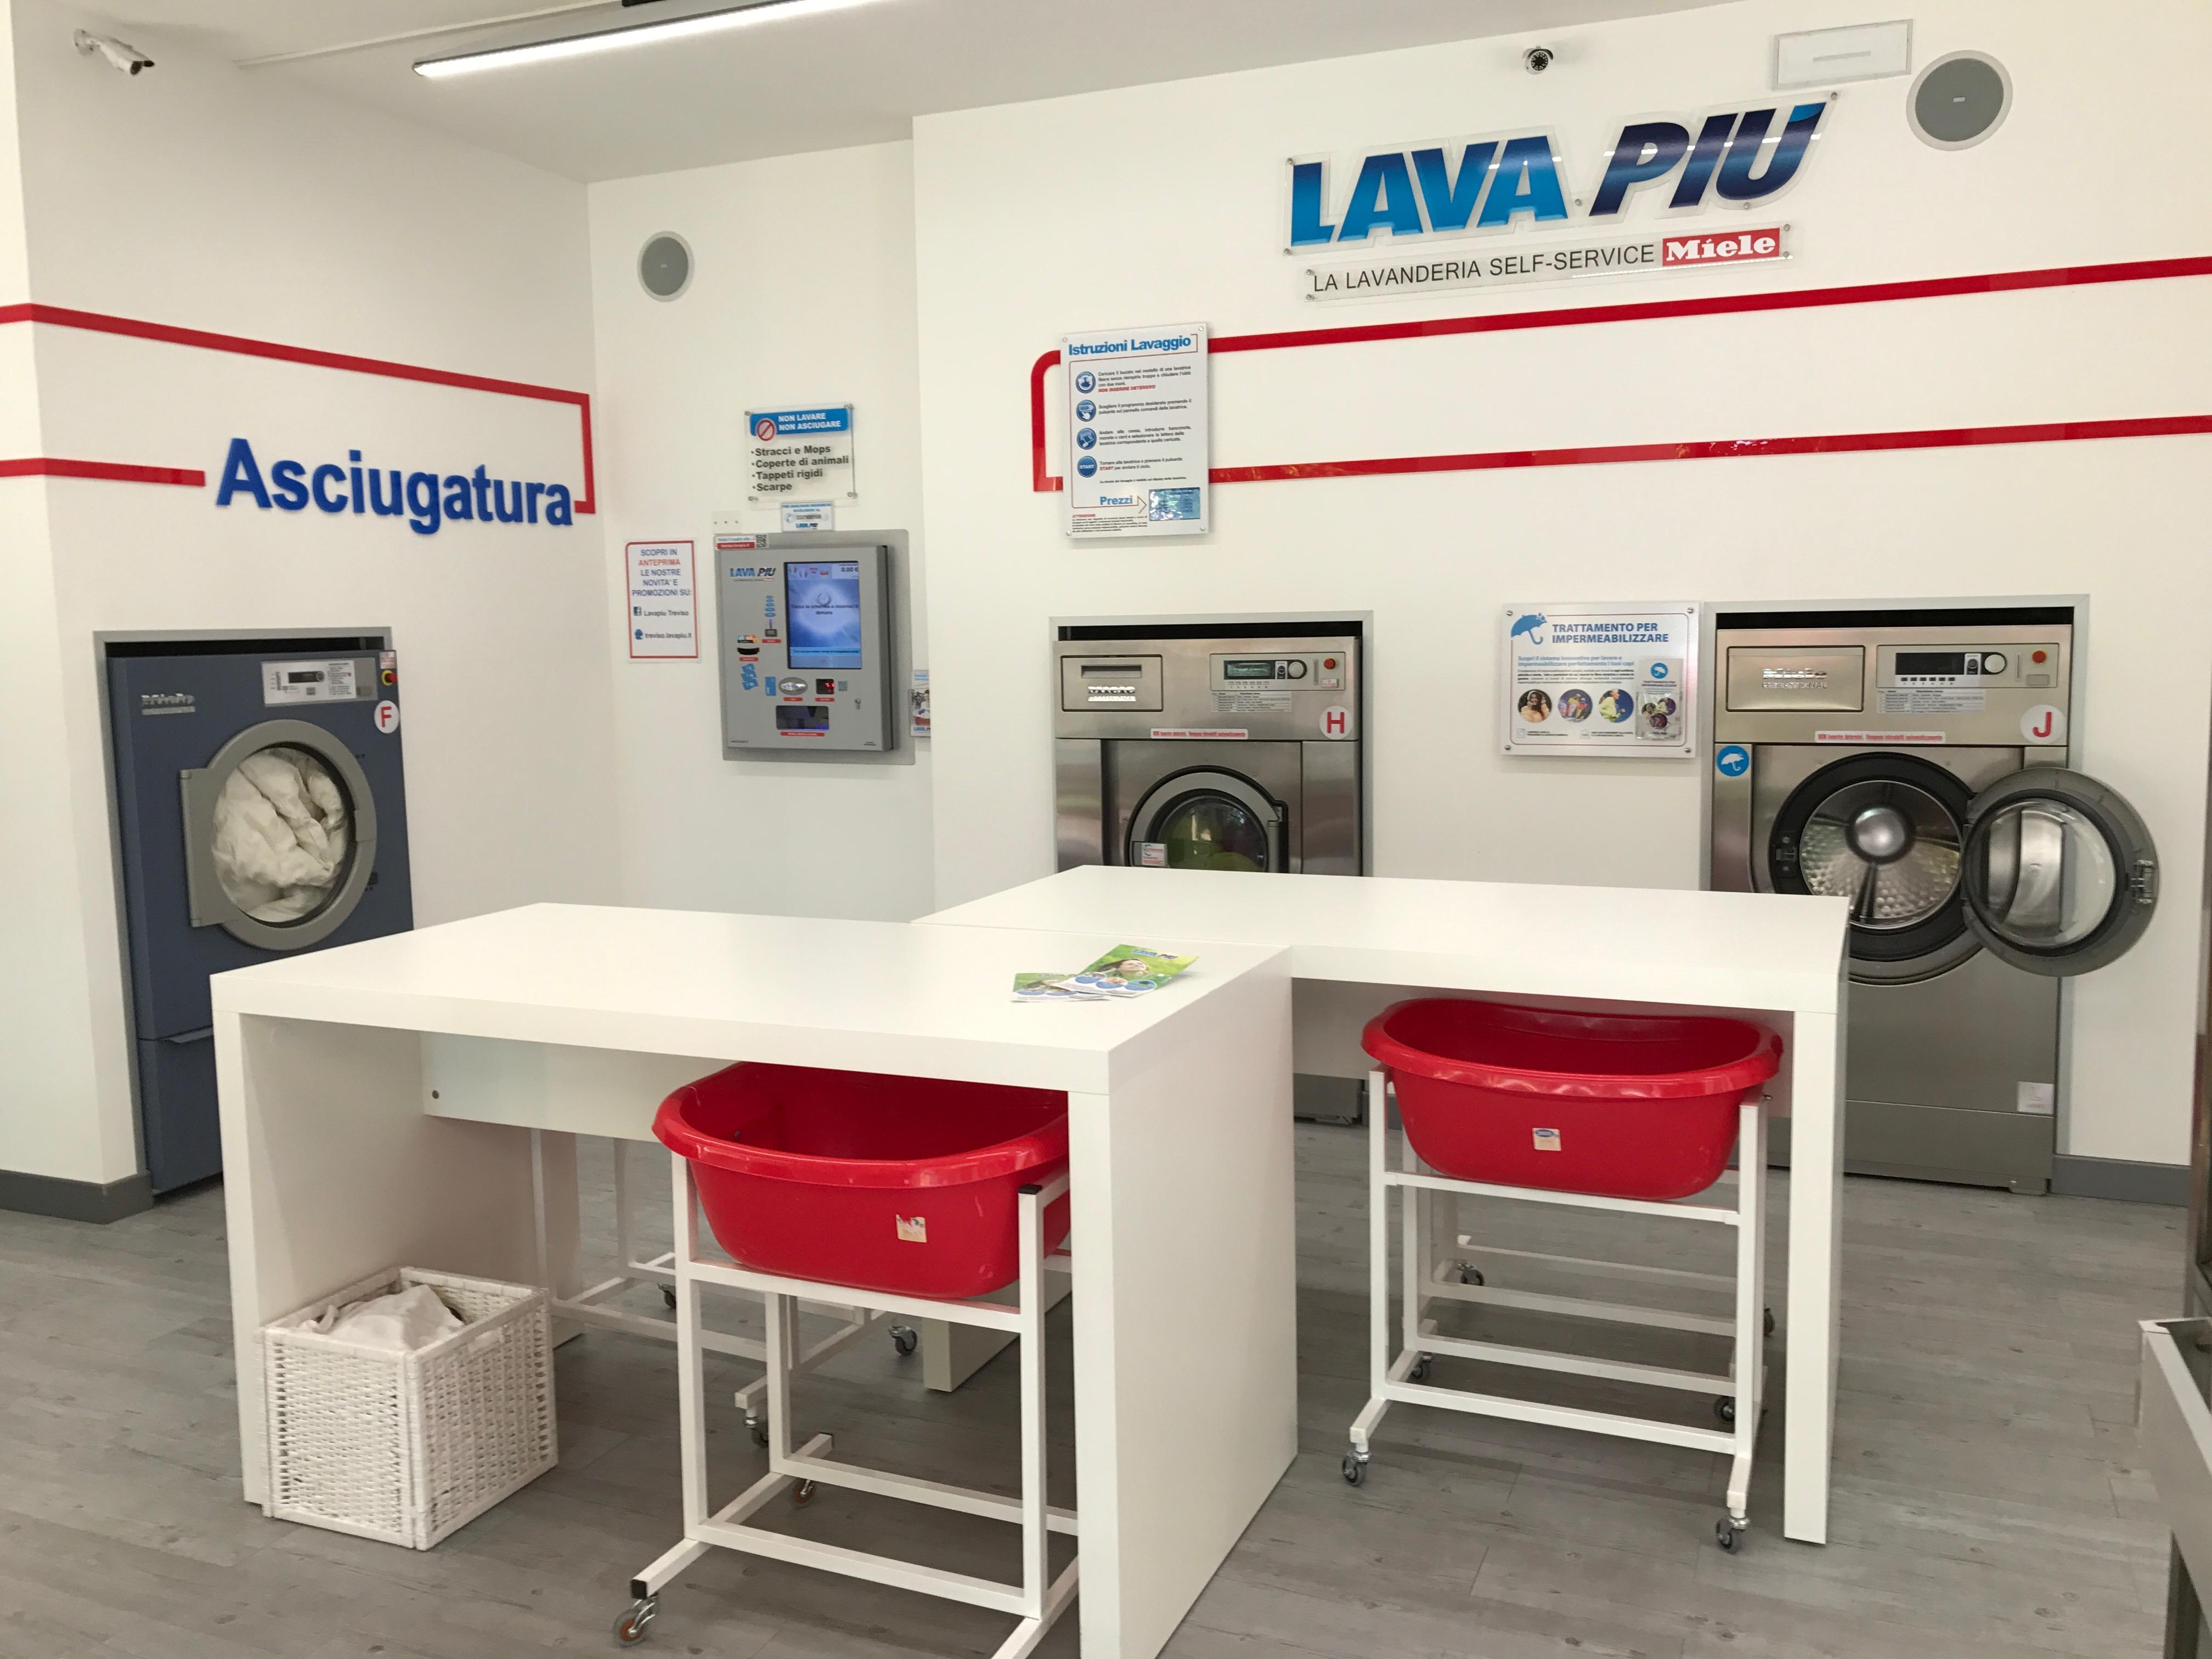 Lavanderia self service lavapi treviso for Lavanderia self service catania